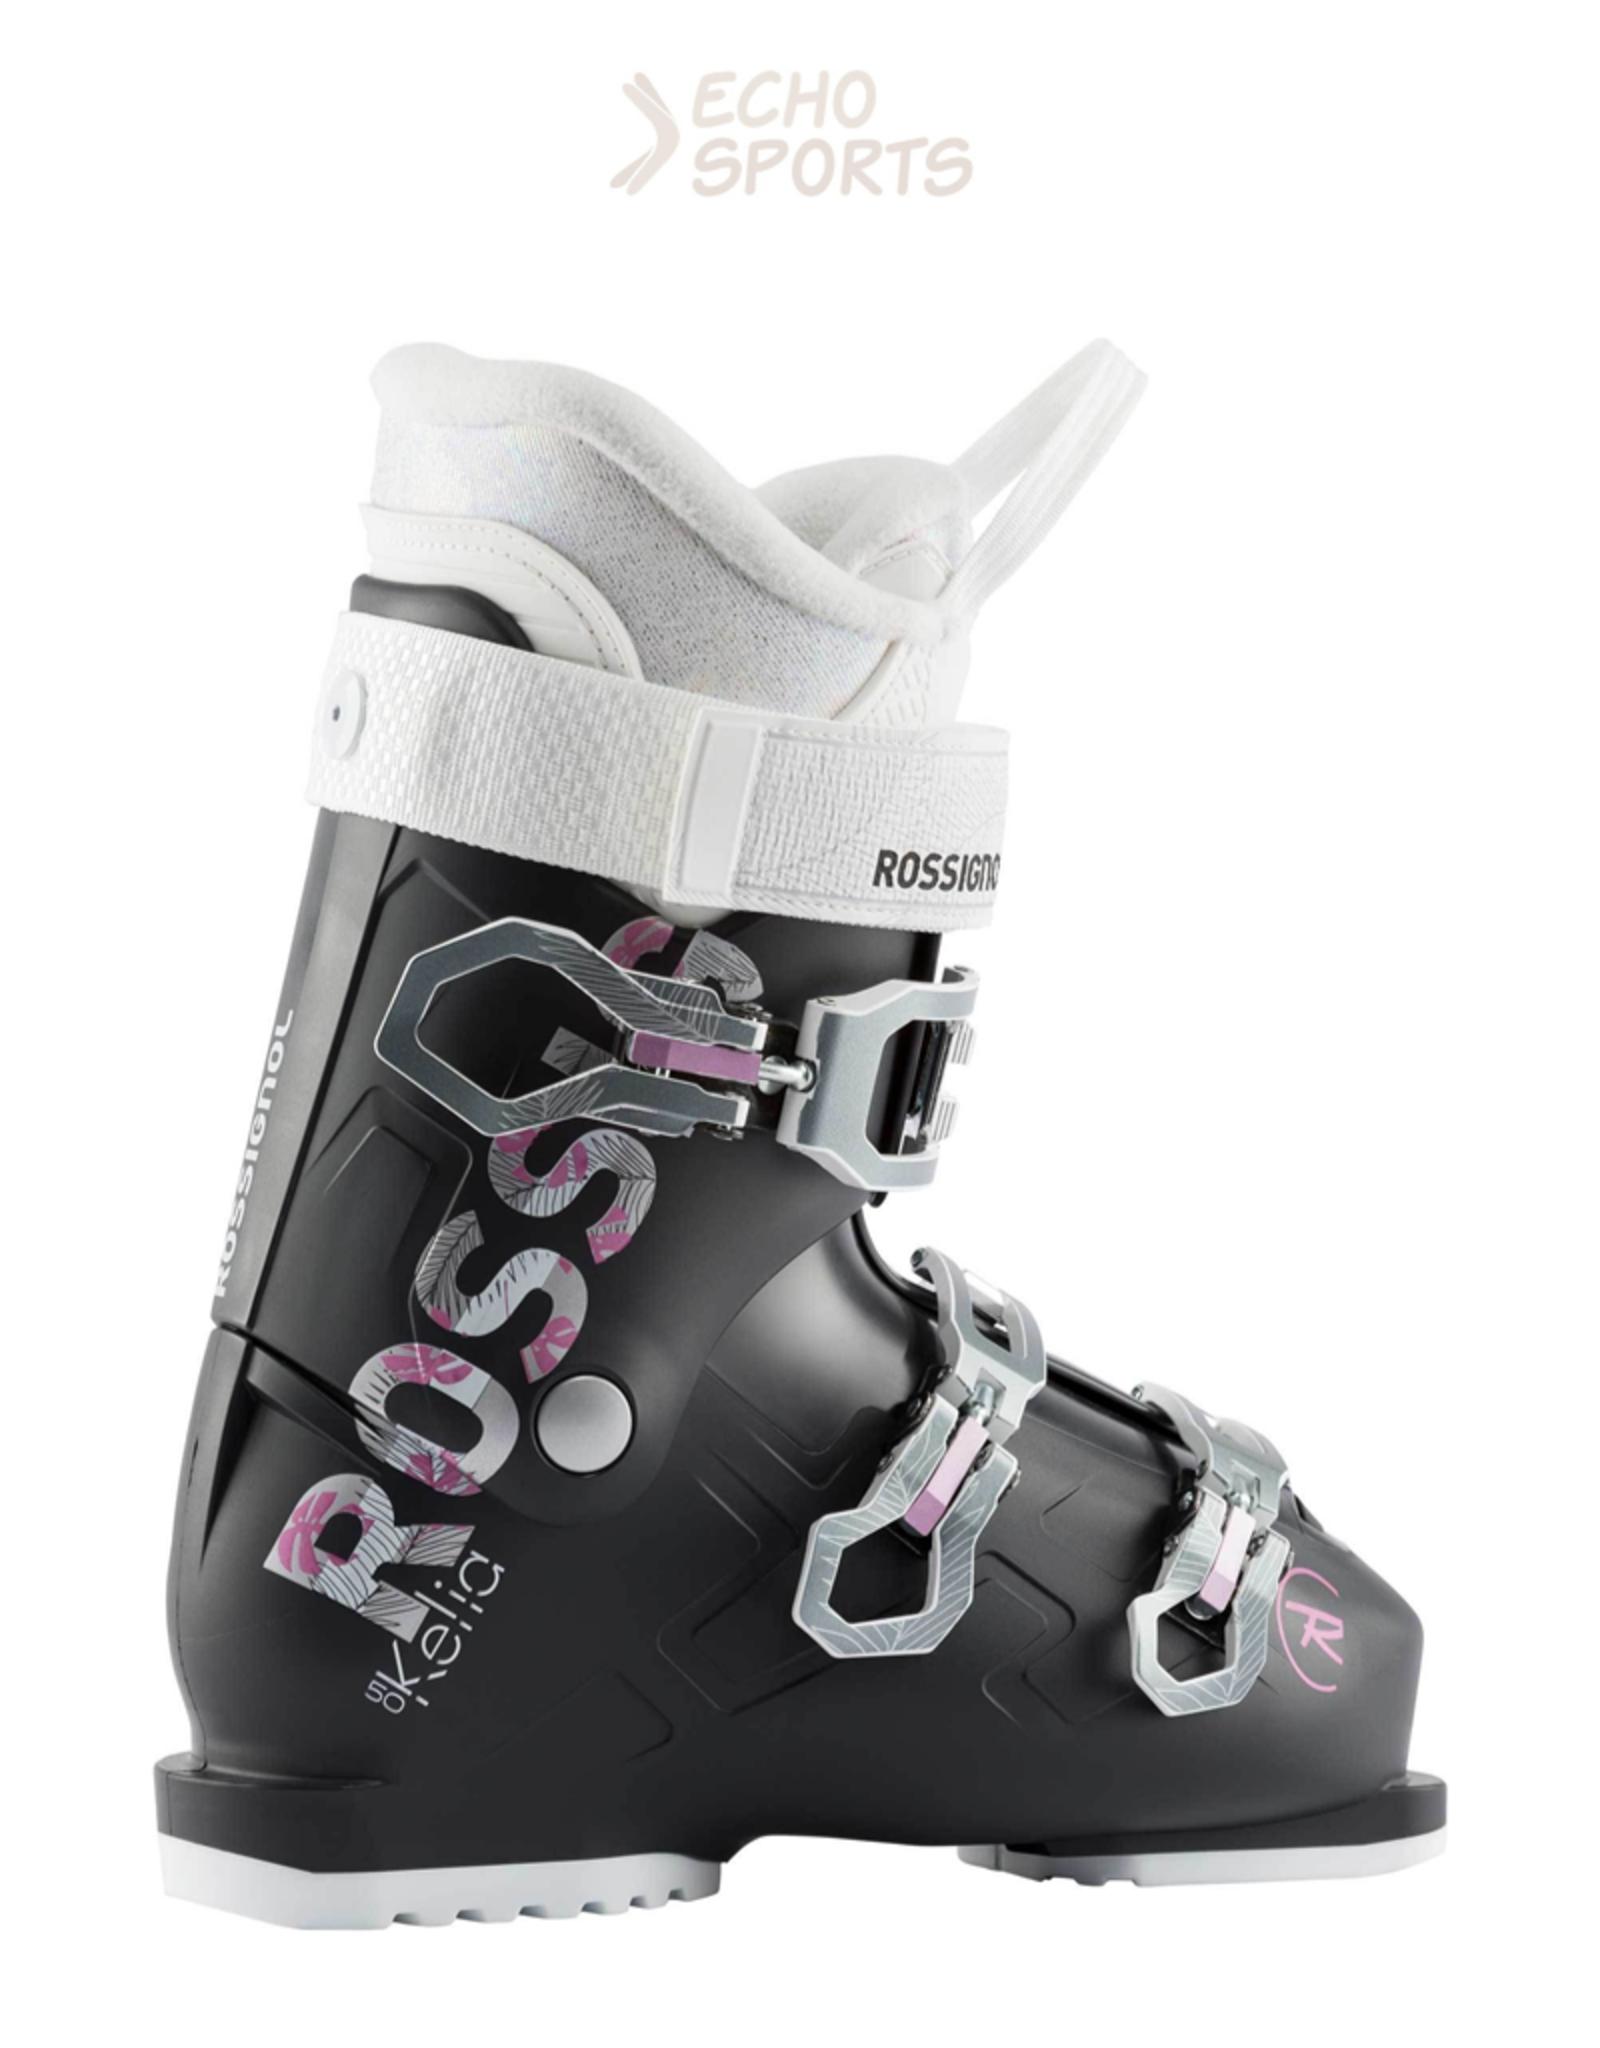 ROSSIGNOL ROSSIGNOL KELIA 50-boot